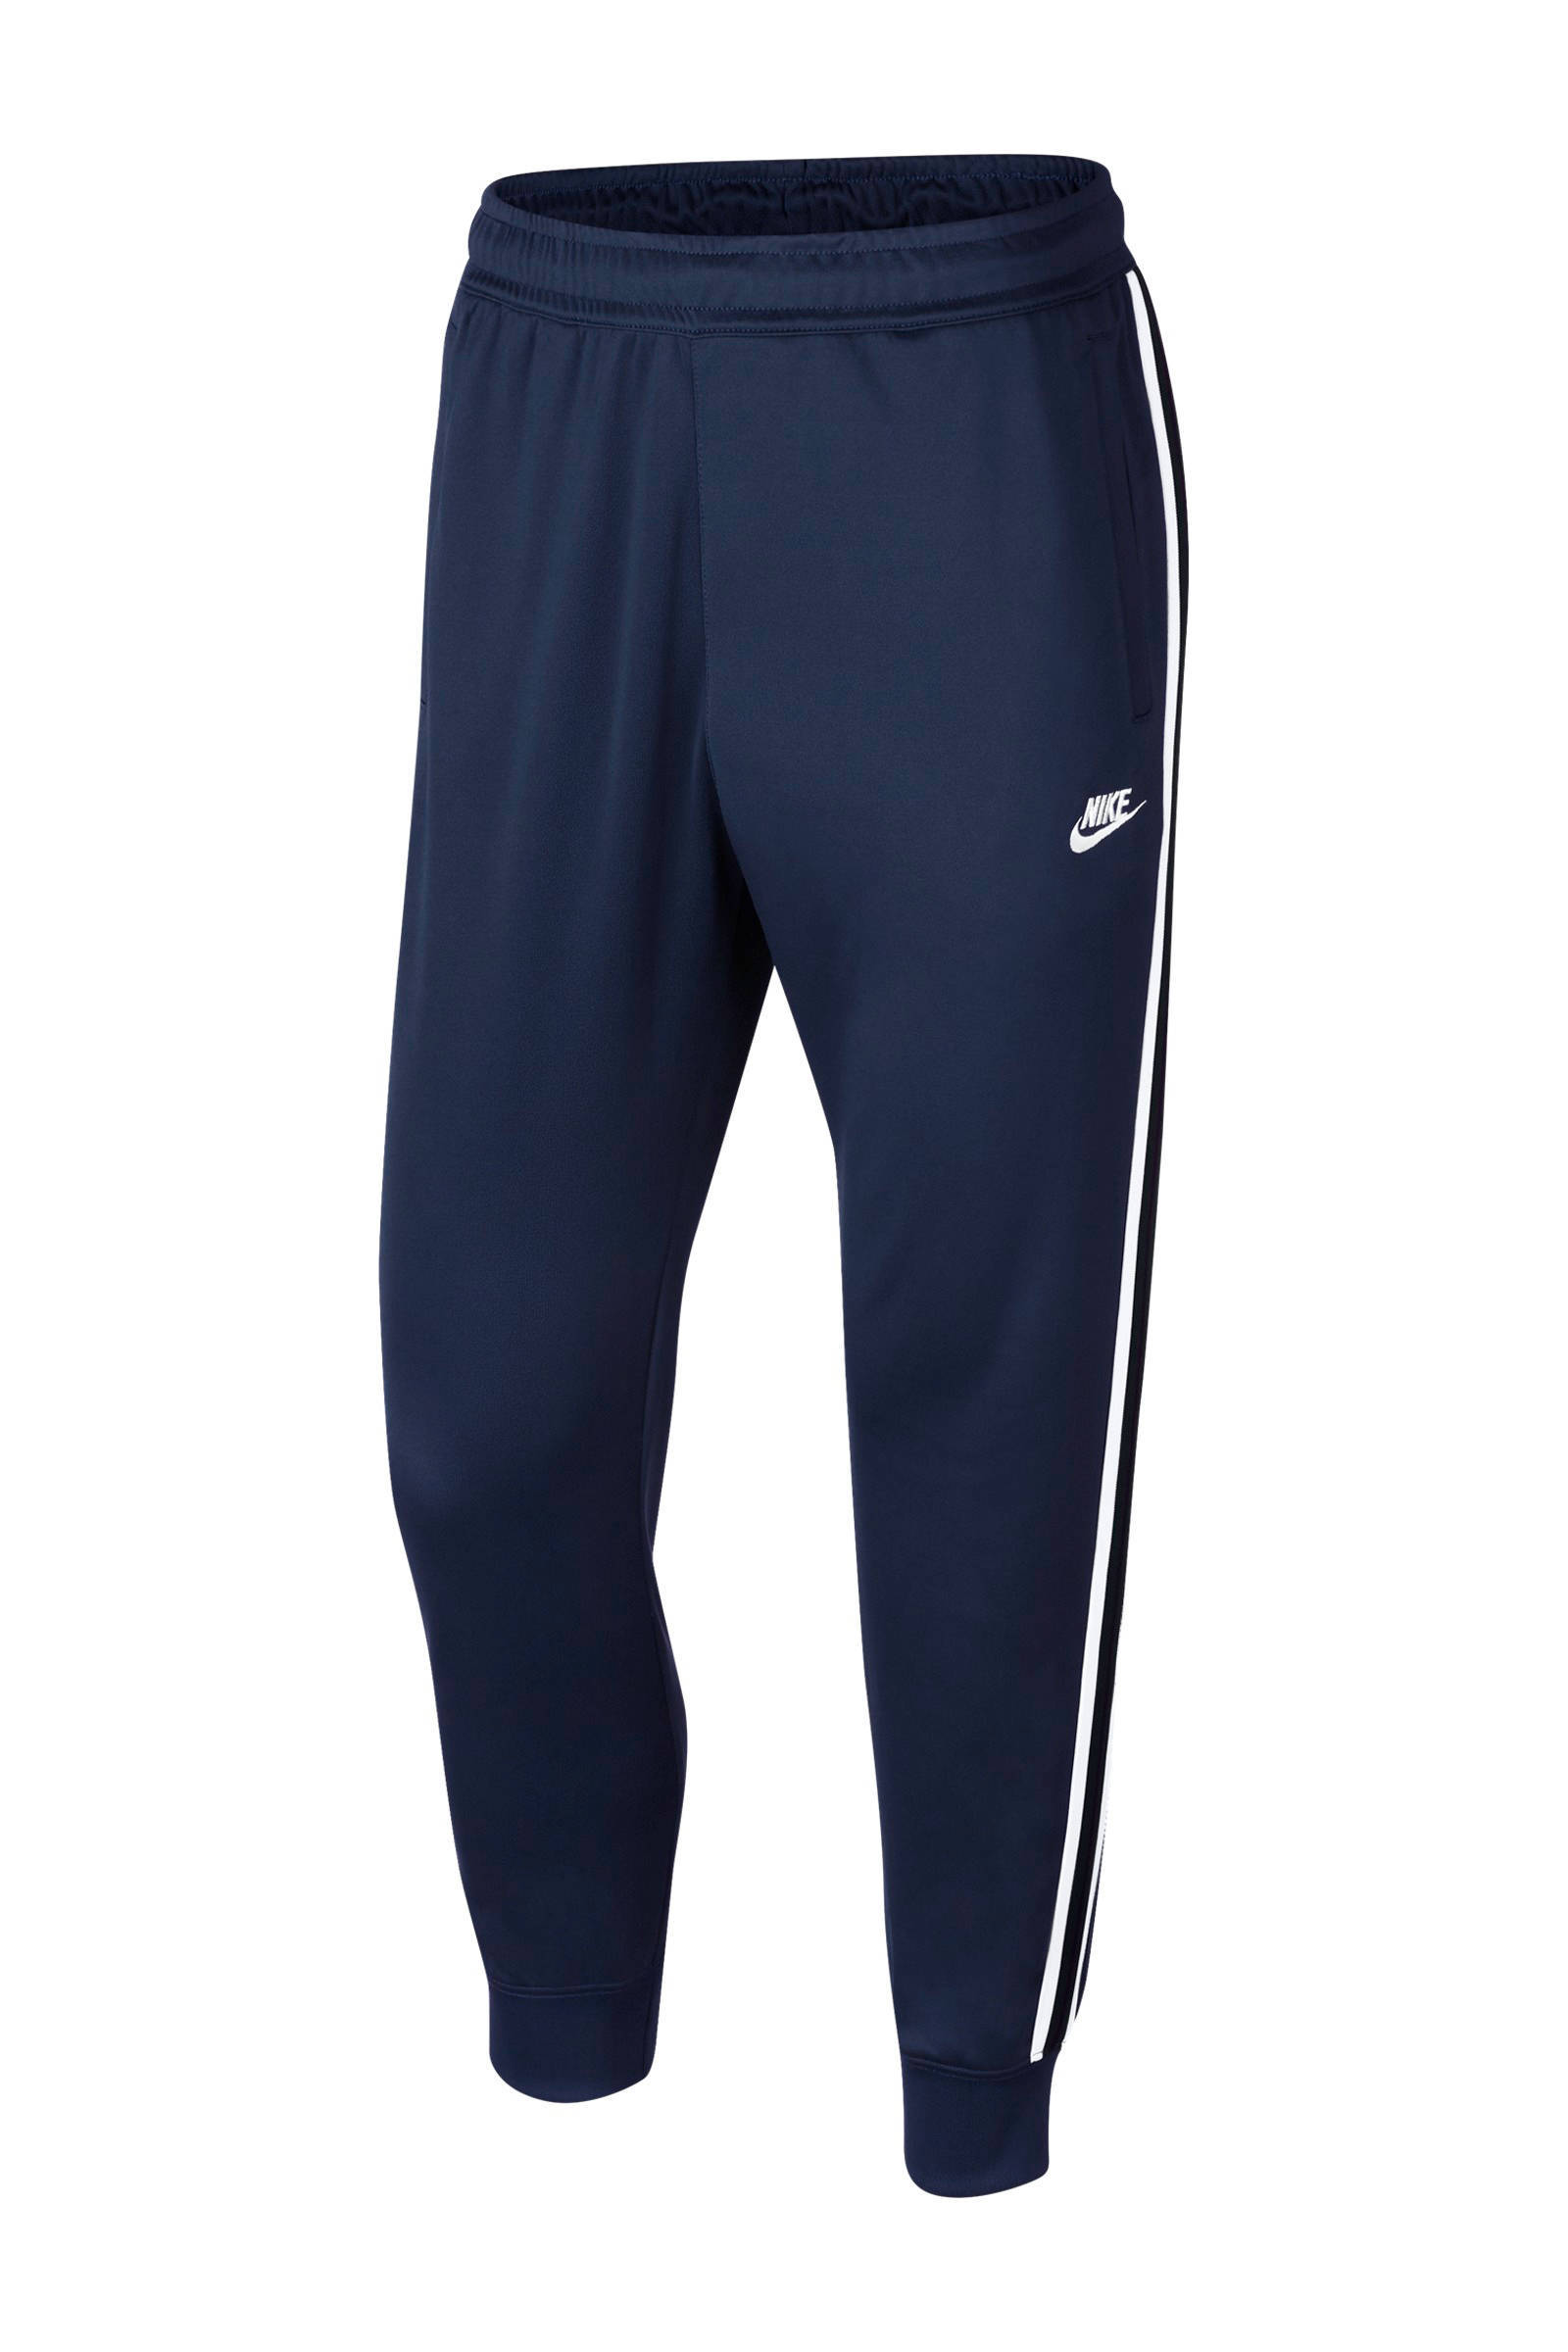 Nike sportbroek zwartgoud   wehkamp